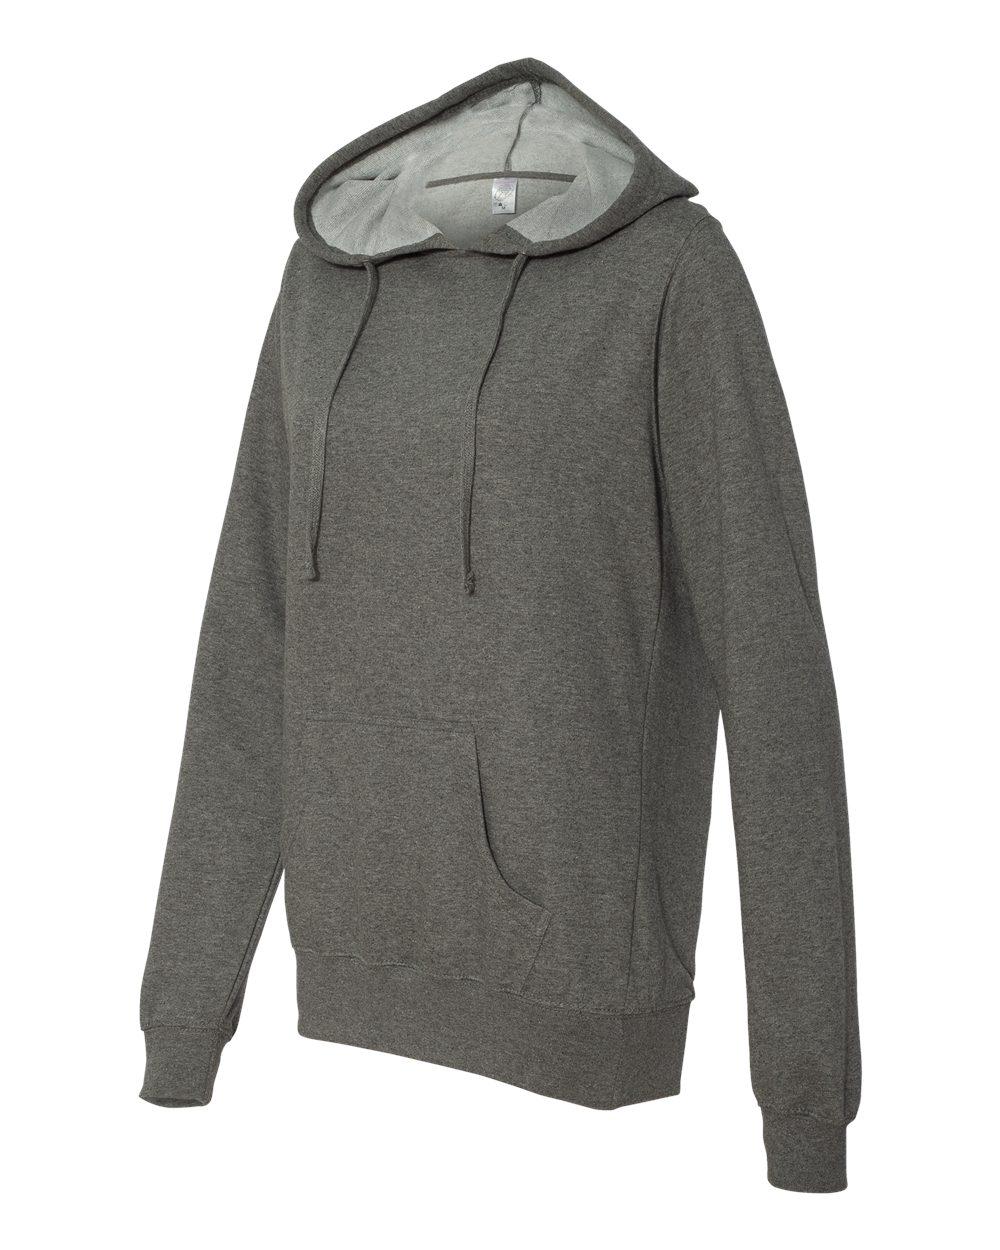 Independent Trading Co. Juniors' Heavenly Fleece Lightweight Pullover Hooded Sweatshirt - SS650